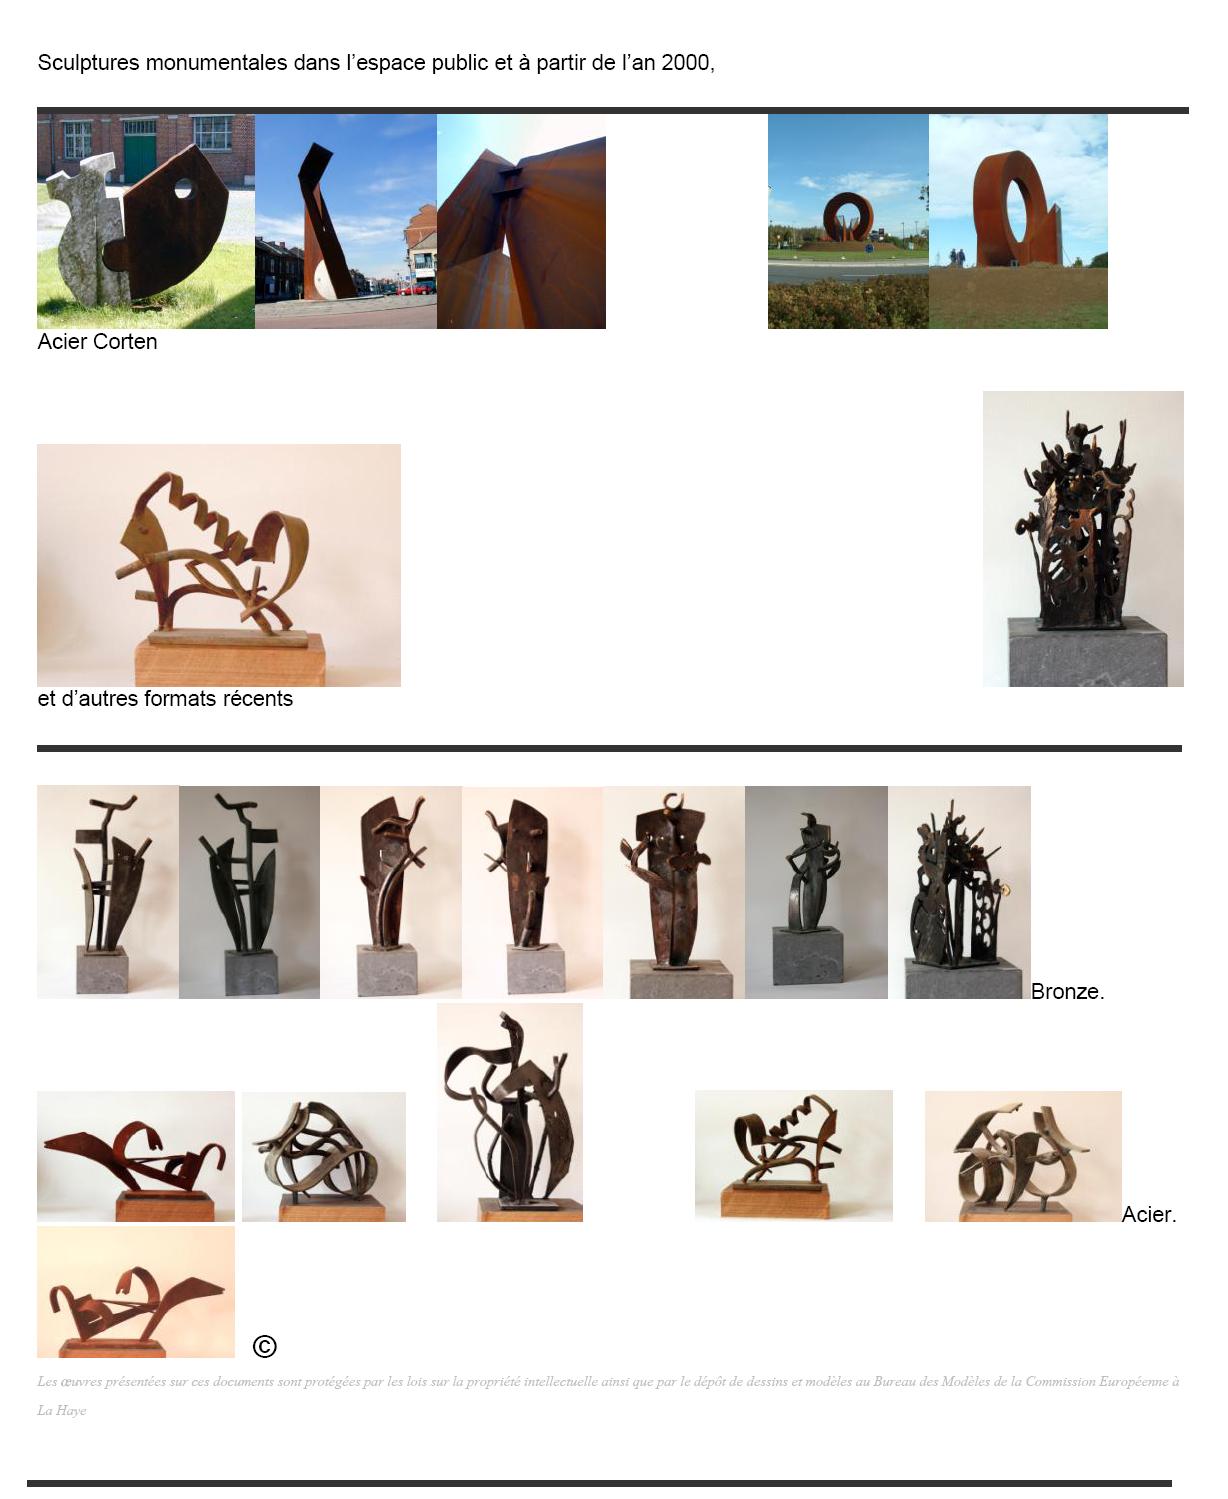 apercu dernières sculptures